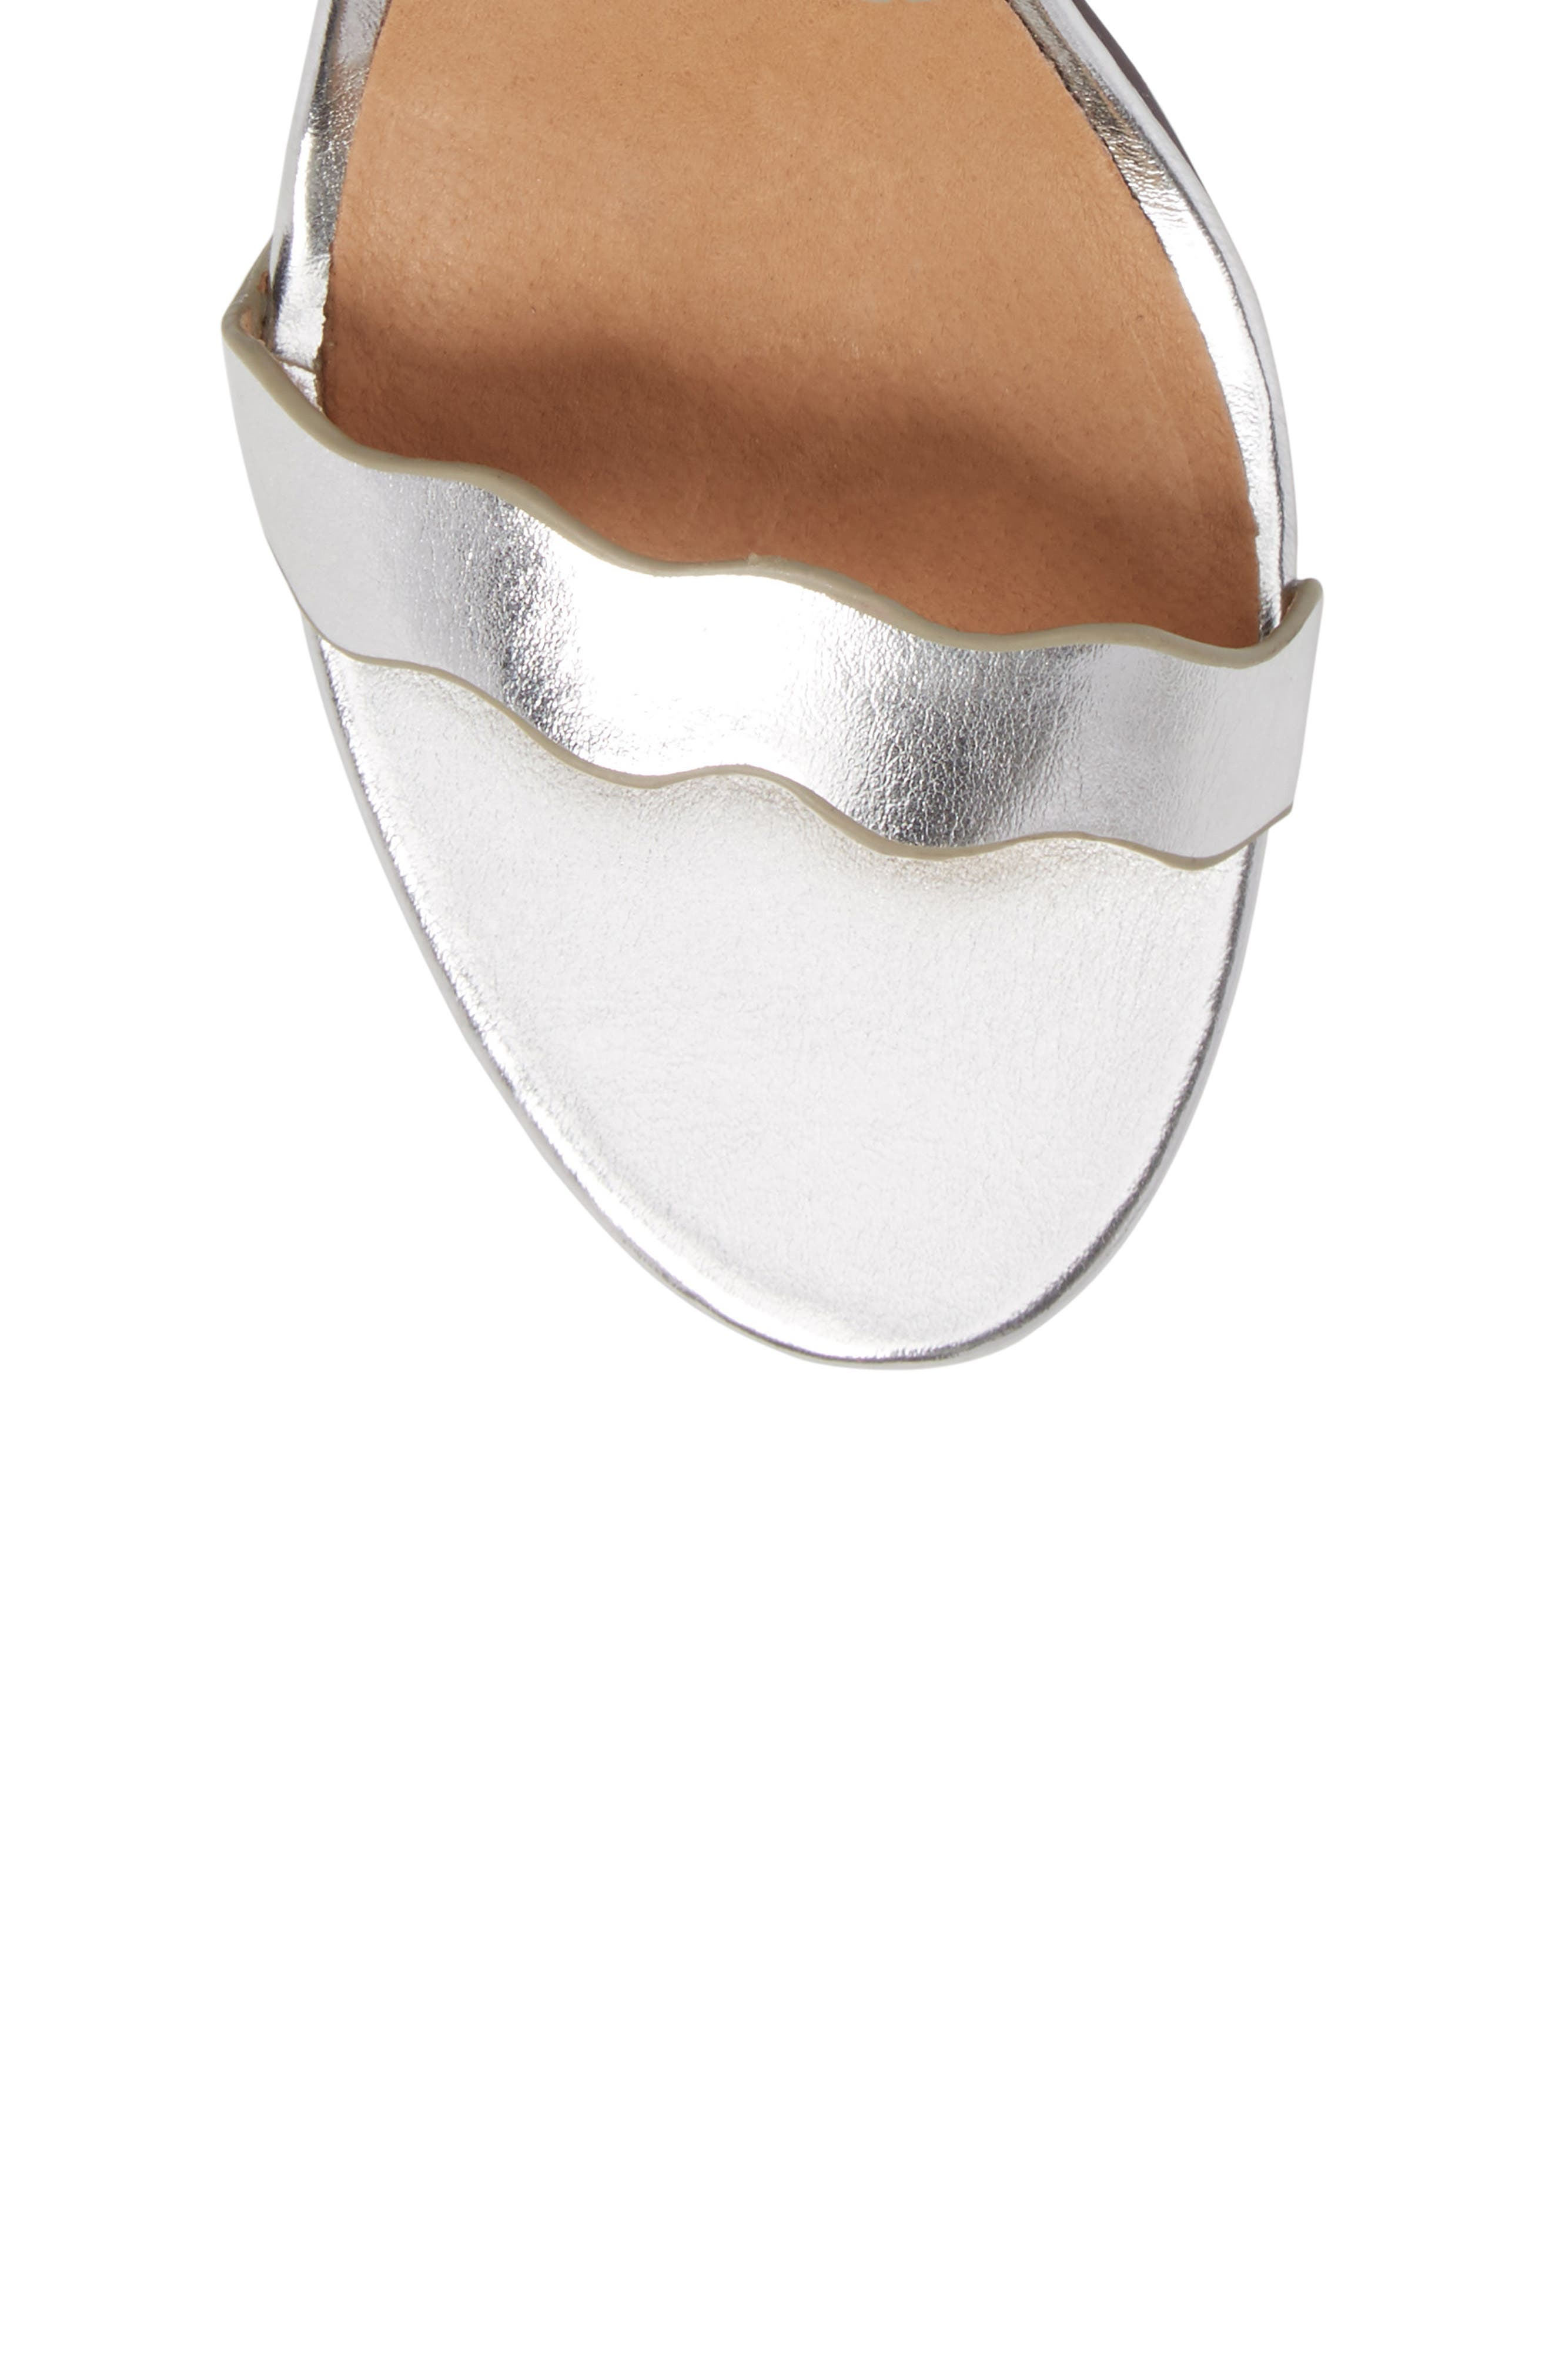 'Rubie' Scalloped Ankle Strap Sandal,                             Alternate thumbnail 5, color,                             040